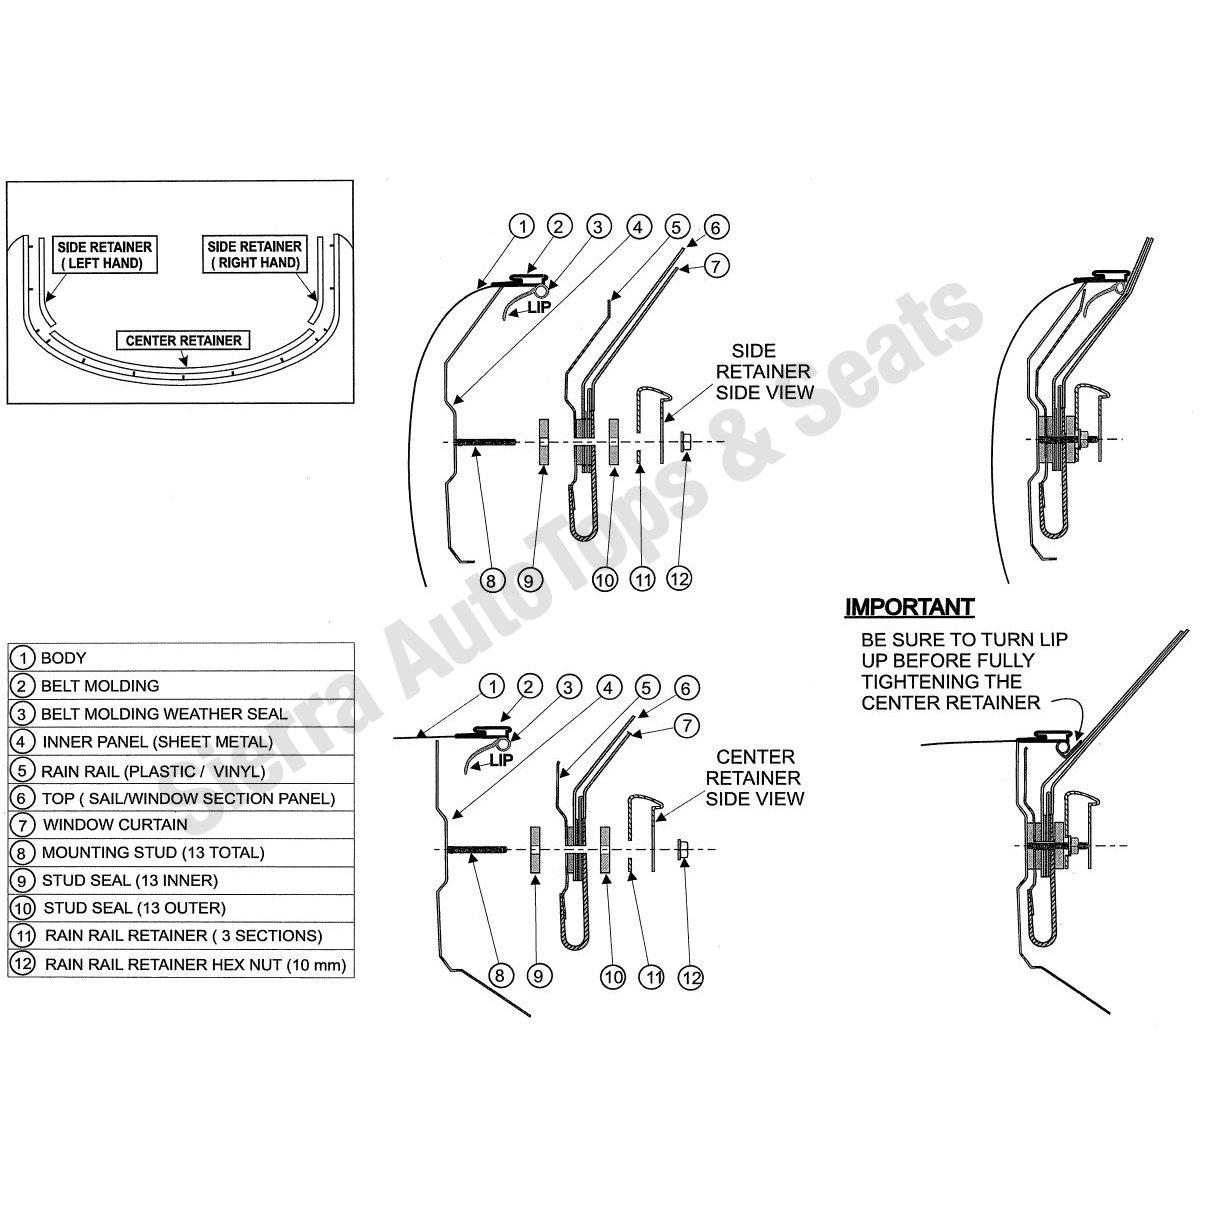 1993 Mazda Miata Wiring Diagram 13 Responses To 1999 Mazda Miata